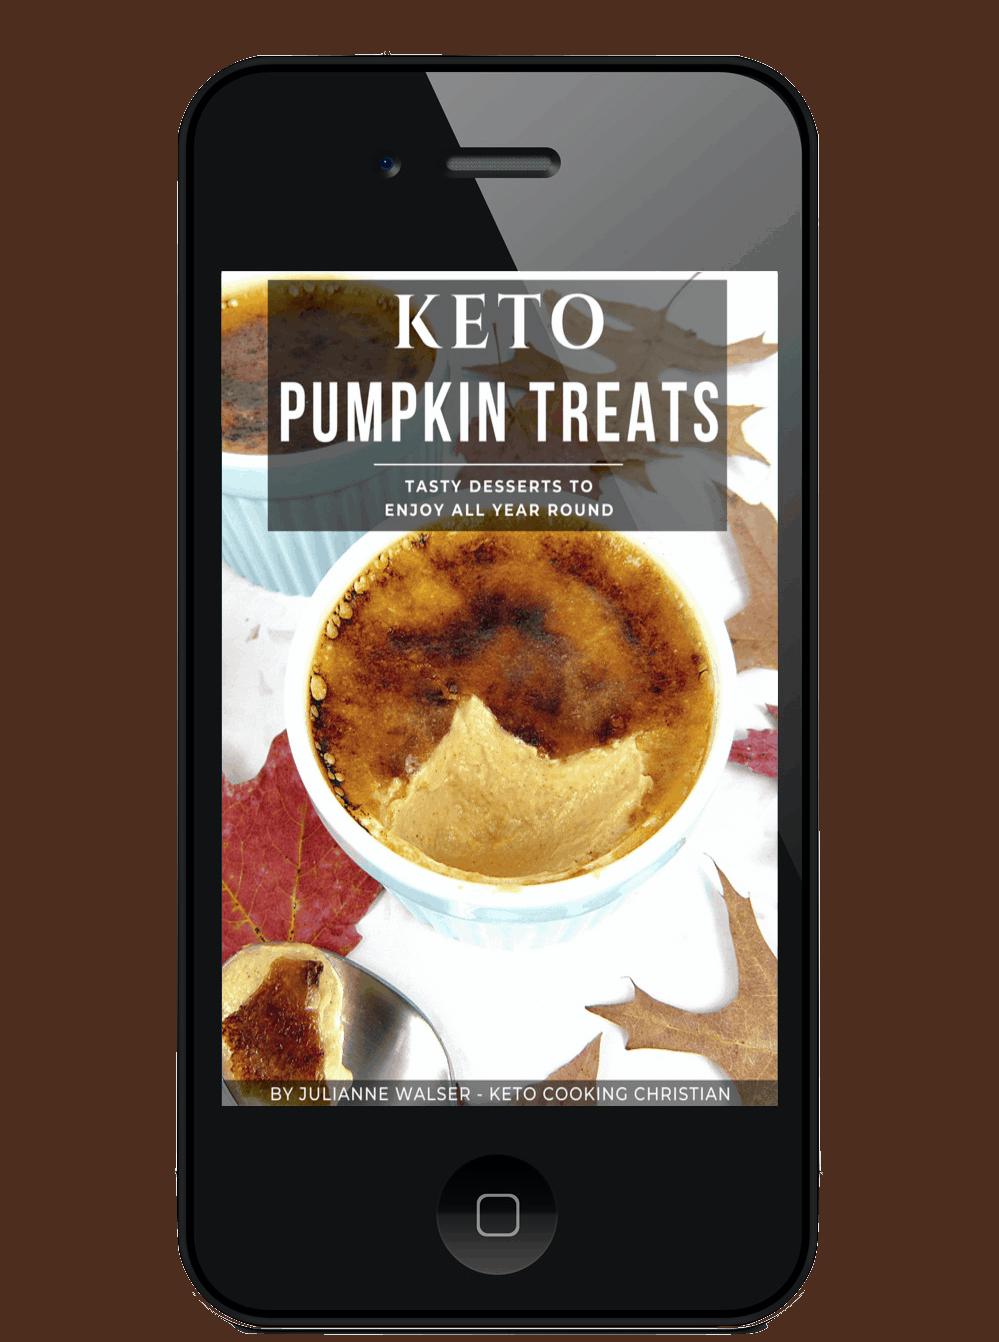 Keto Pumpkin Treats eBook on Mobile device